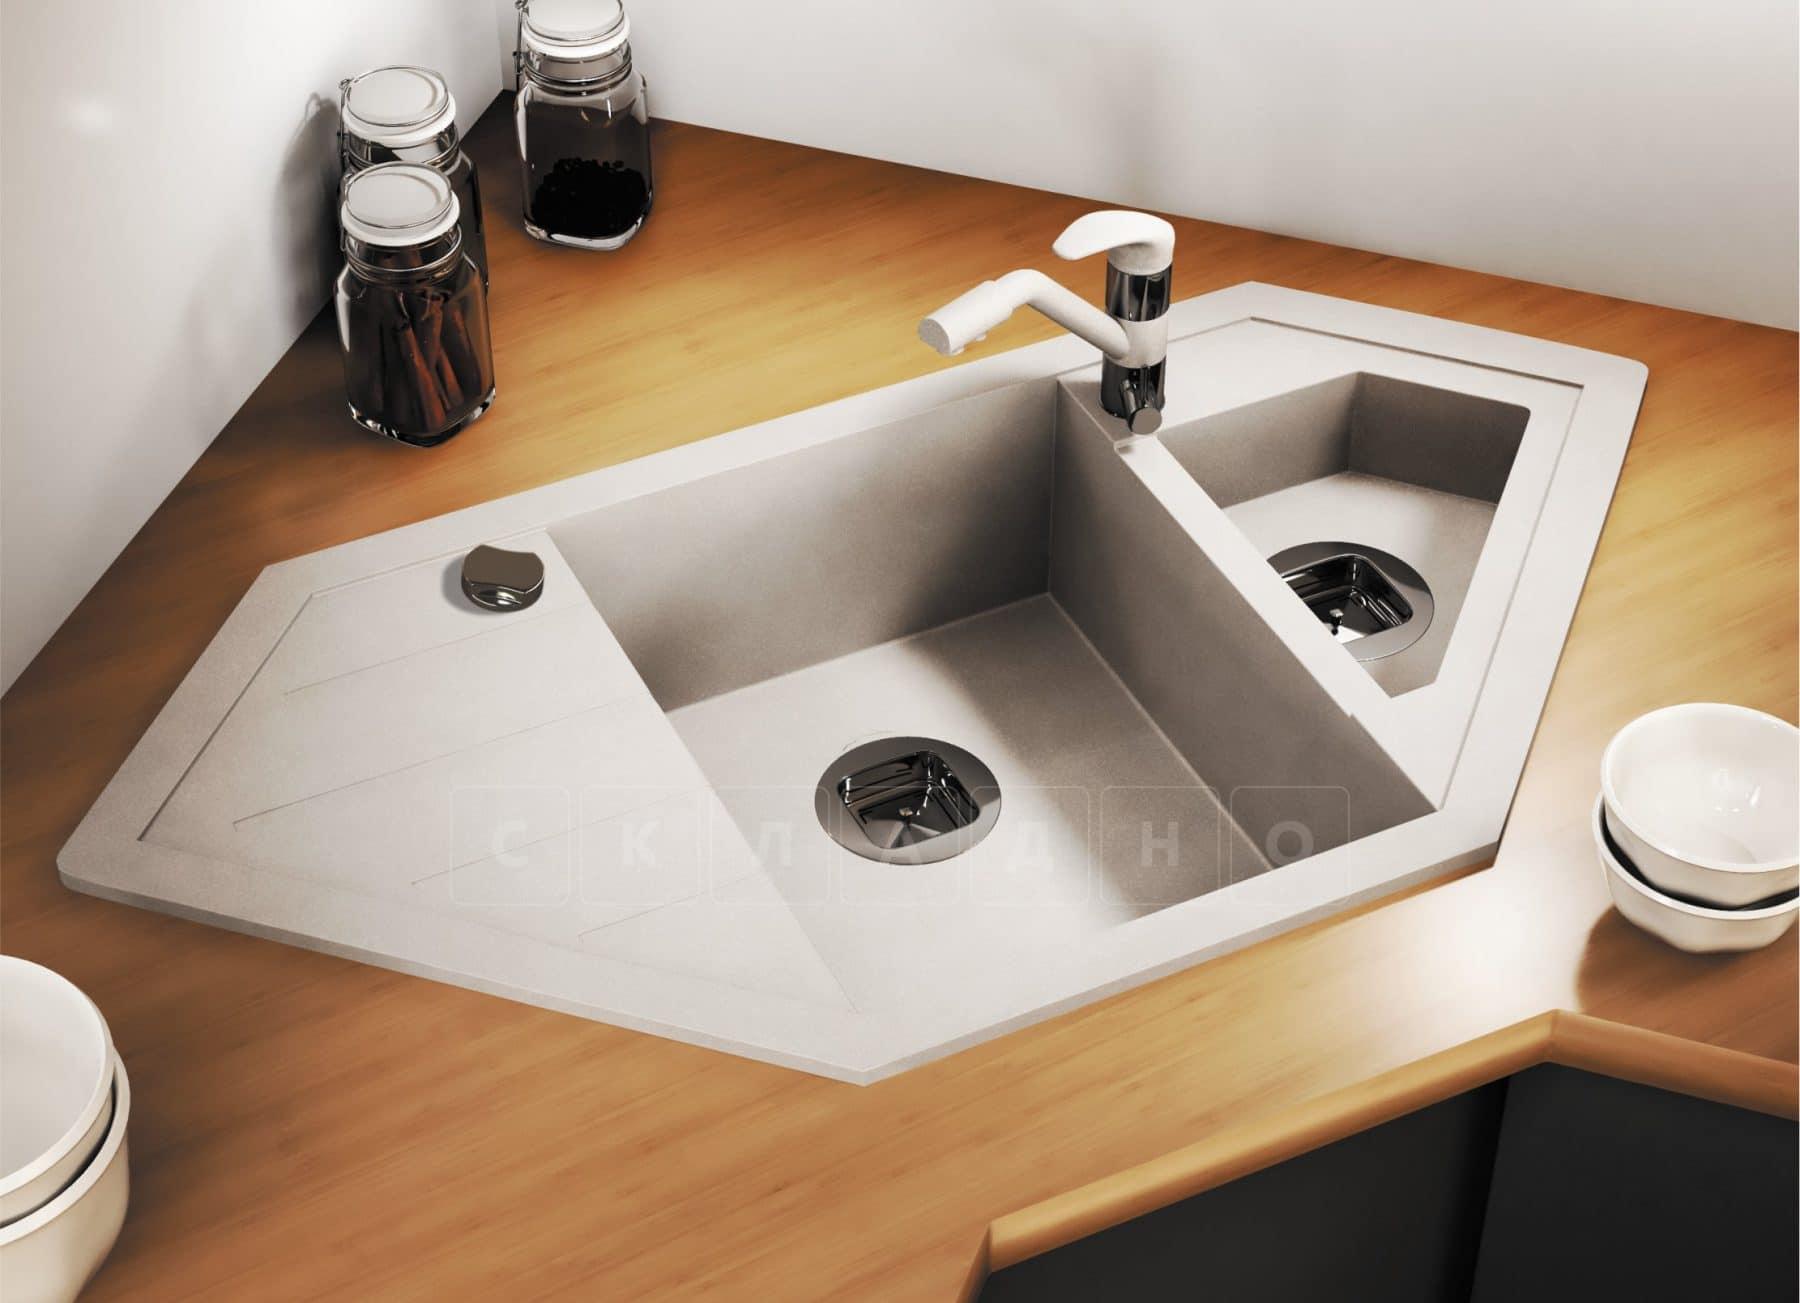 Кухонная мойка TOLERO R-114 кварцевая 100х50 см угловая фото 12   интернет-магазин Складно